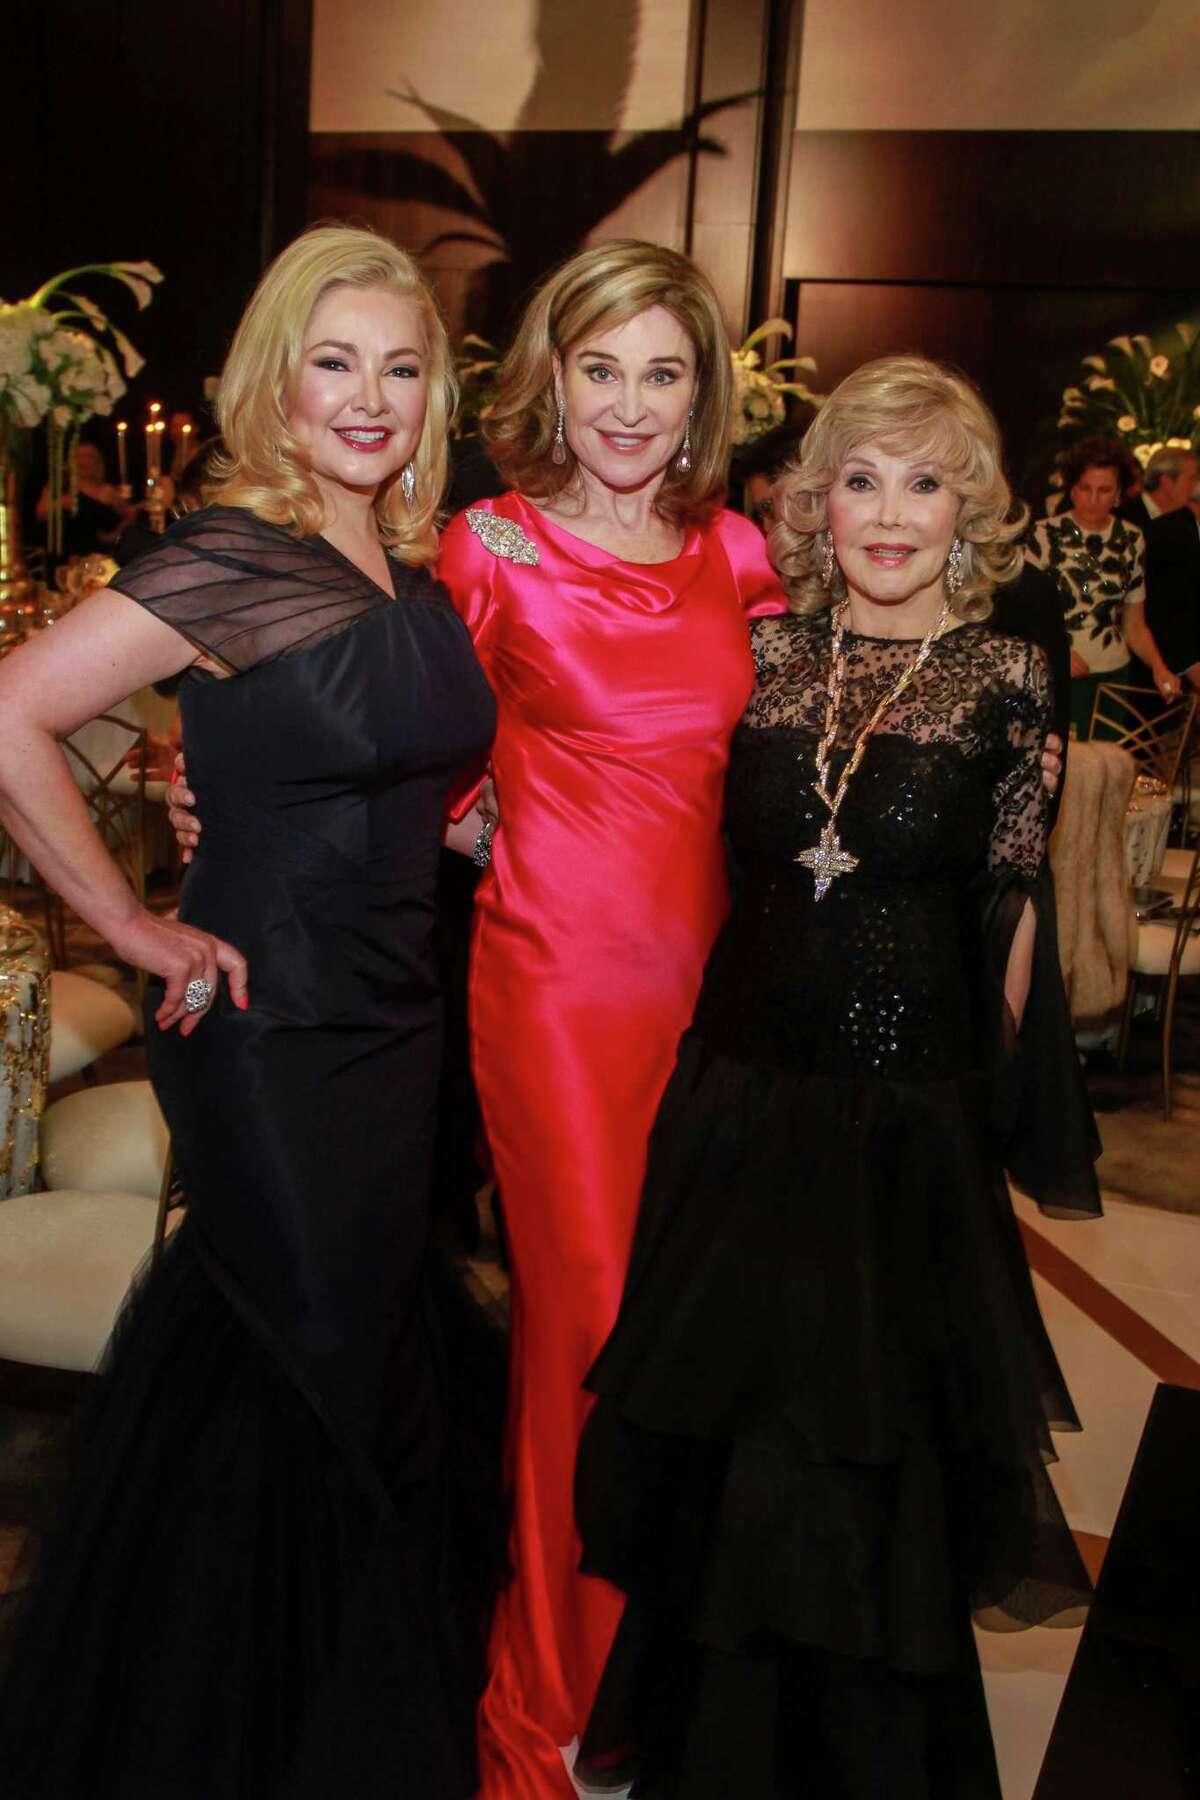 Whitney Crane, from left, Becca Cason Thrash and Joanne King Herring at the Houston Grand Opera Ball.